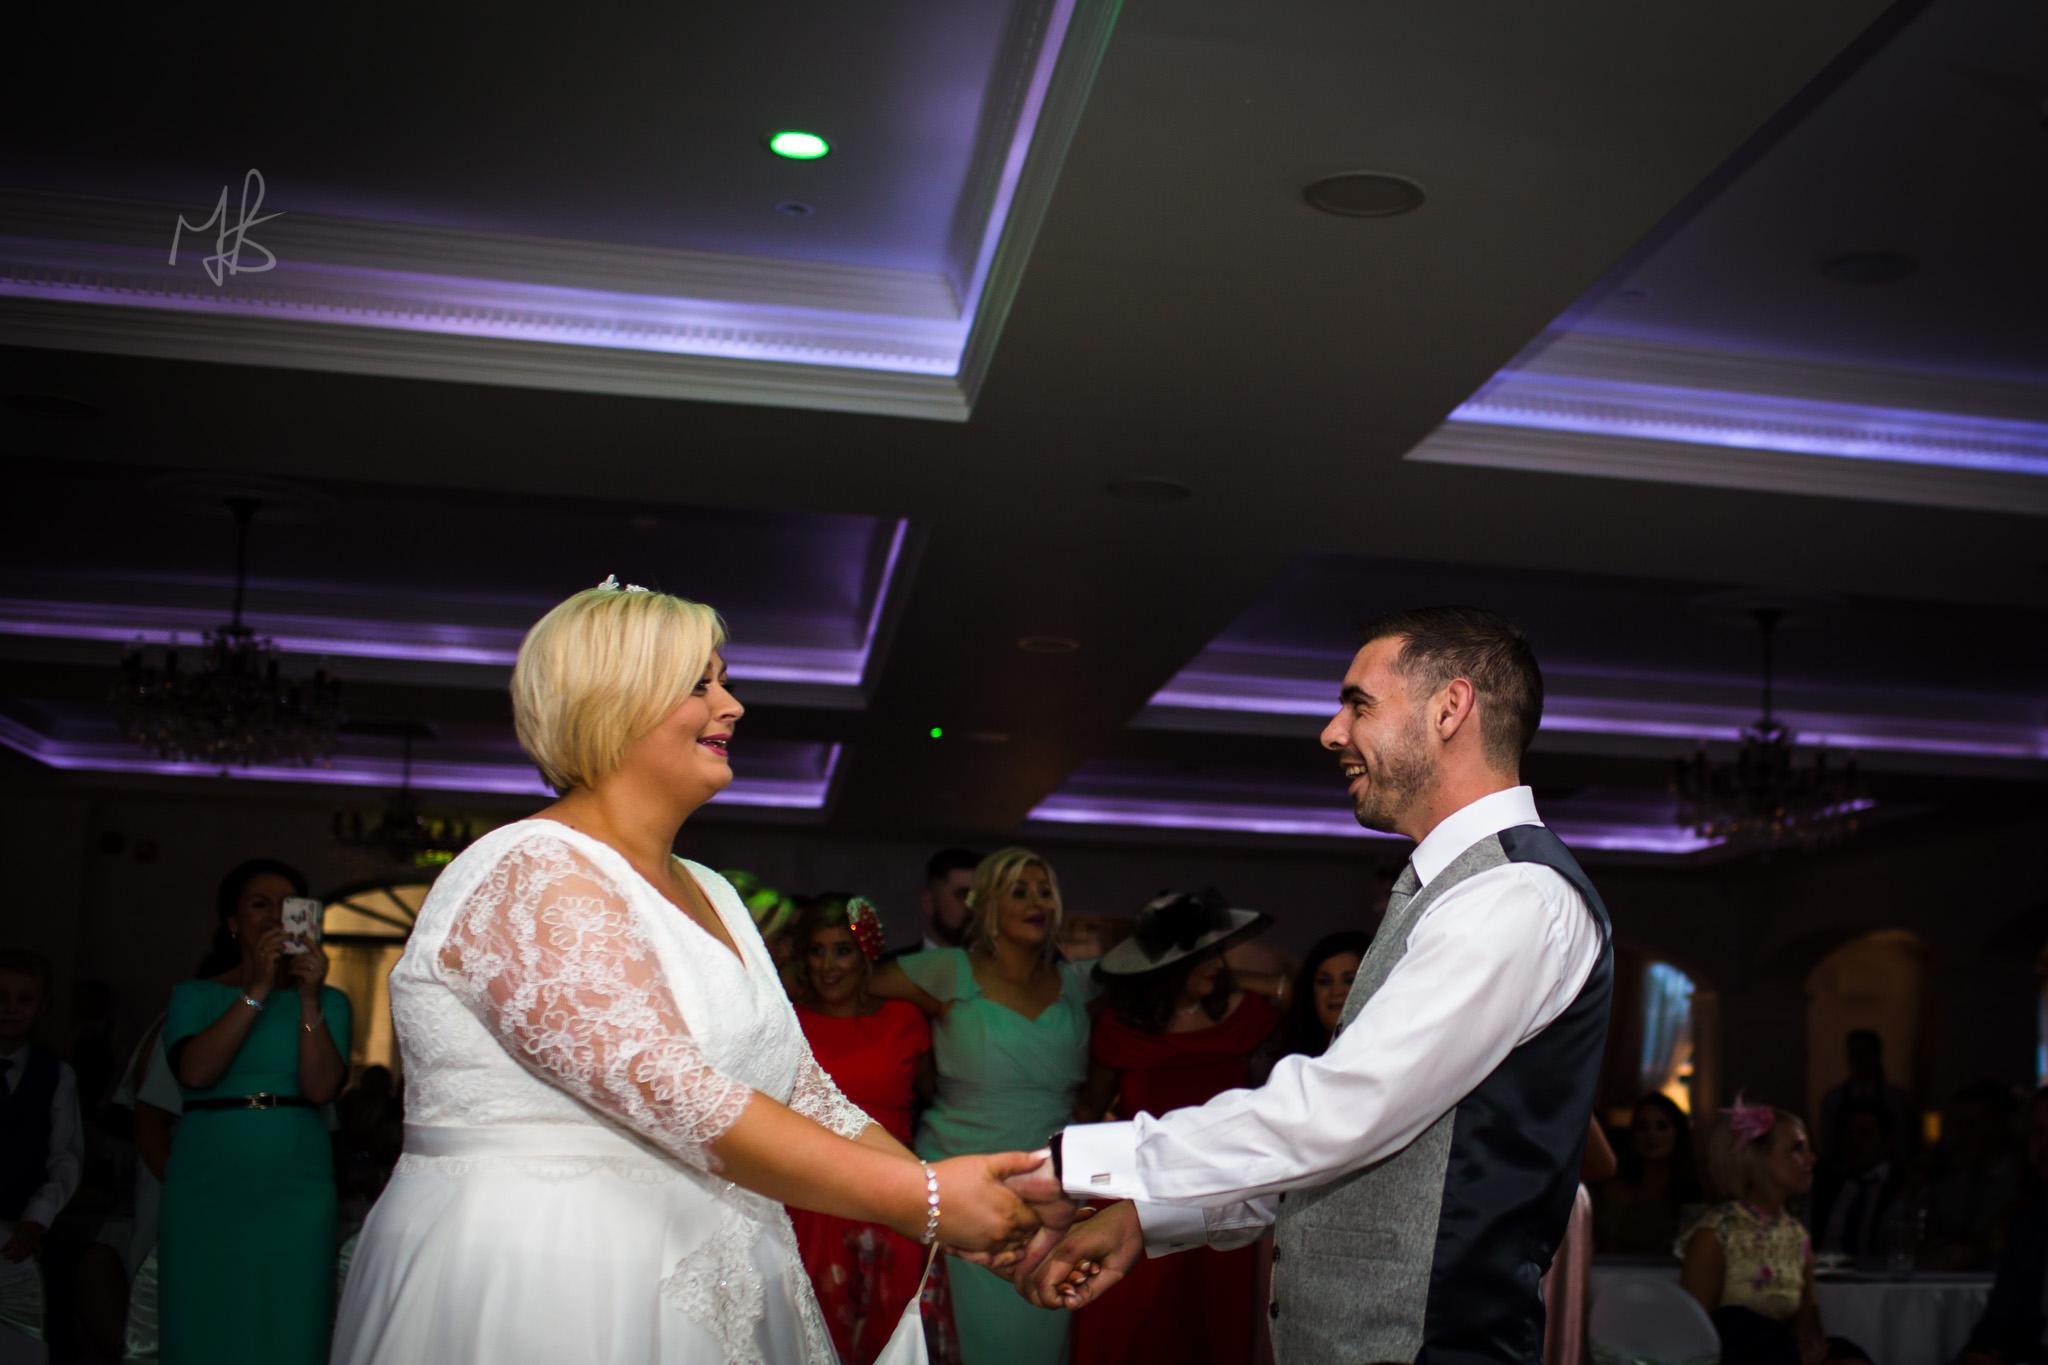 Northern-Ireland-Wedding-Photographer-Mark-Barnes-Ballymena_wedding-photography-Leighinmohr-House-Seamas_Alanna_For-web-49.jpg